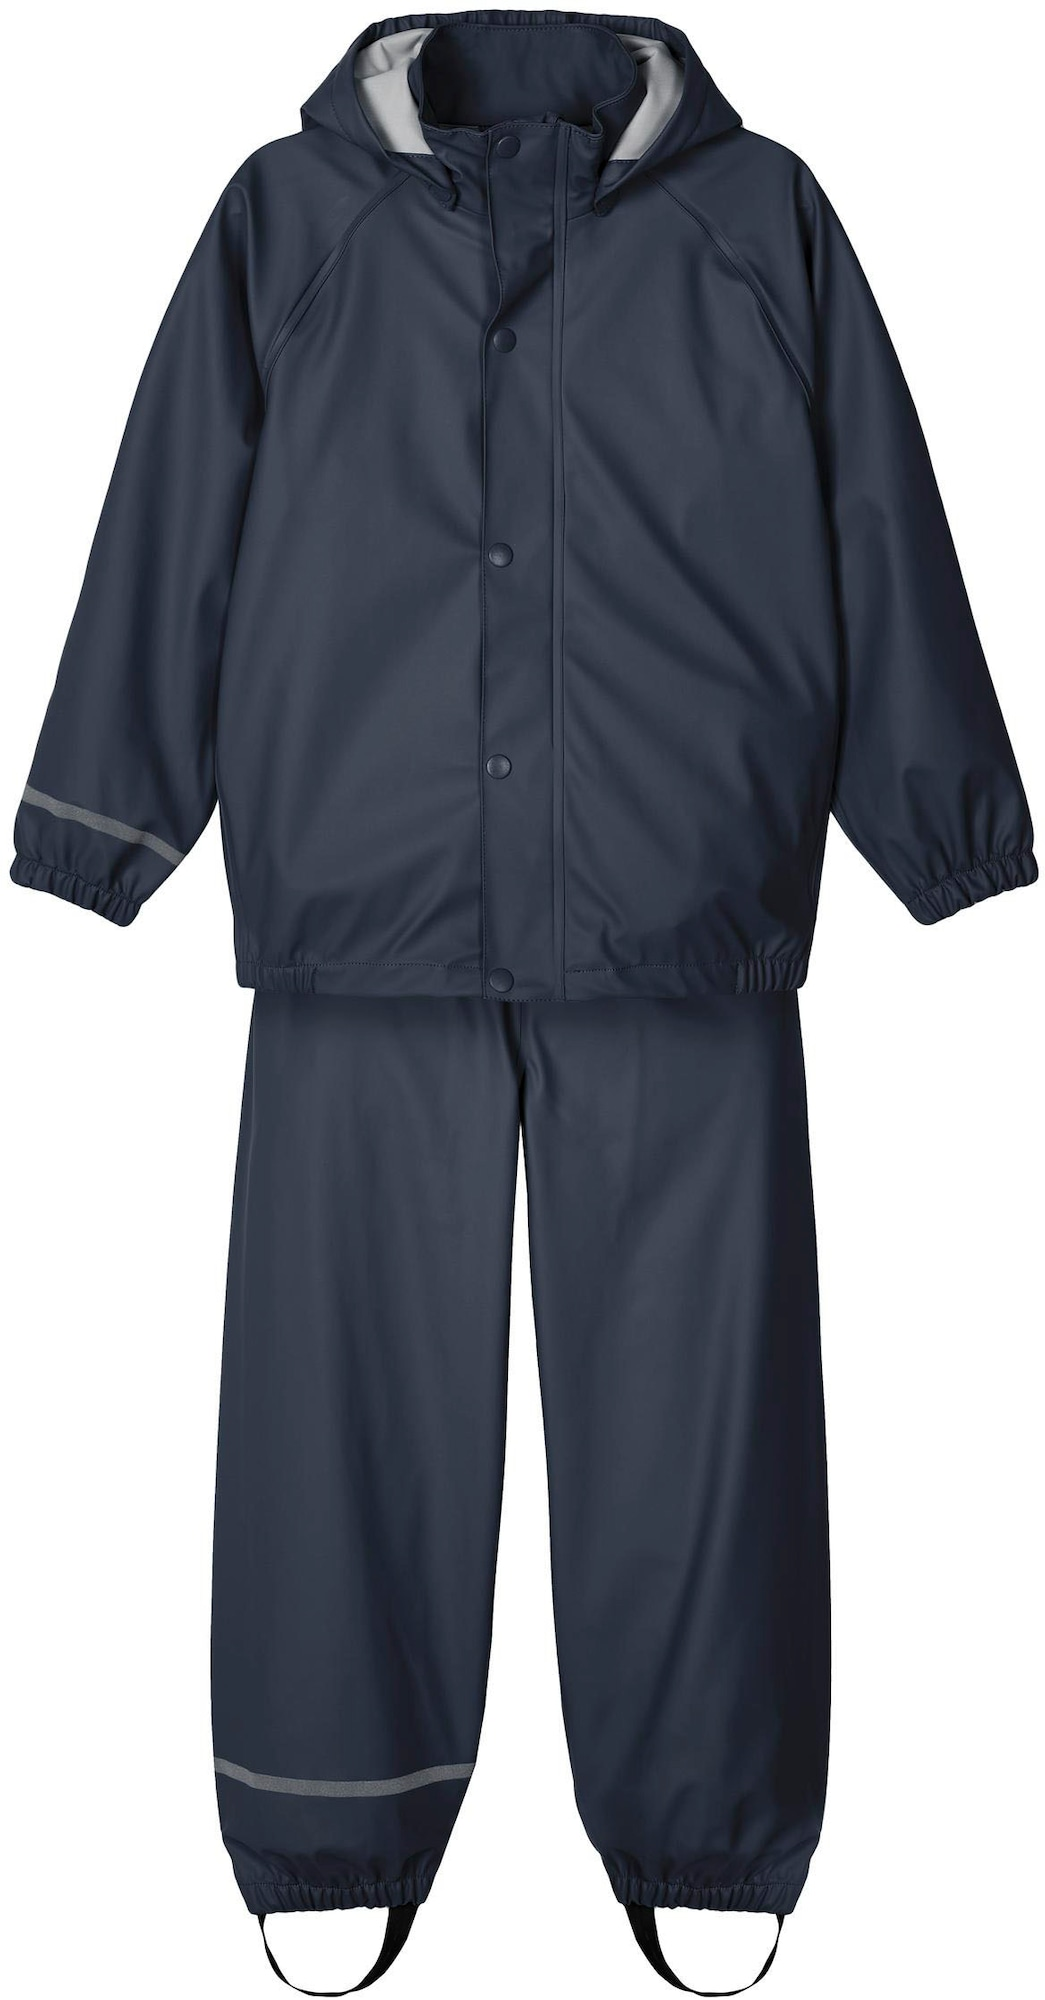 NAME IT Funkcinis kostiumas nakties mėlyna